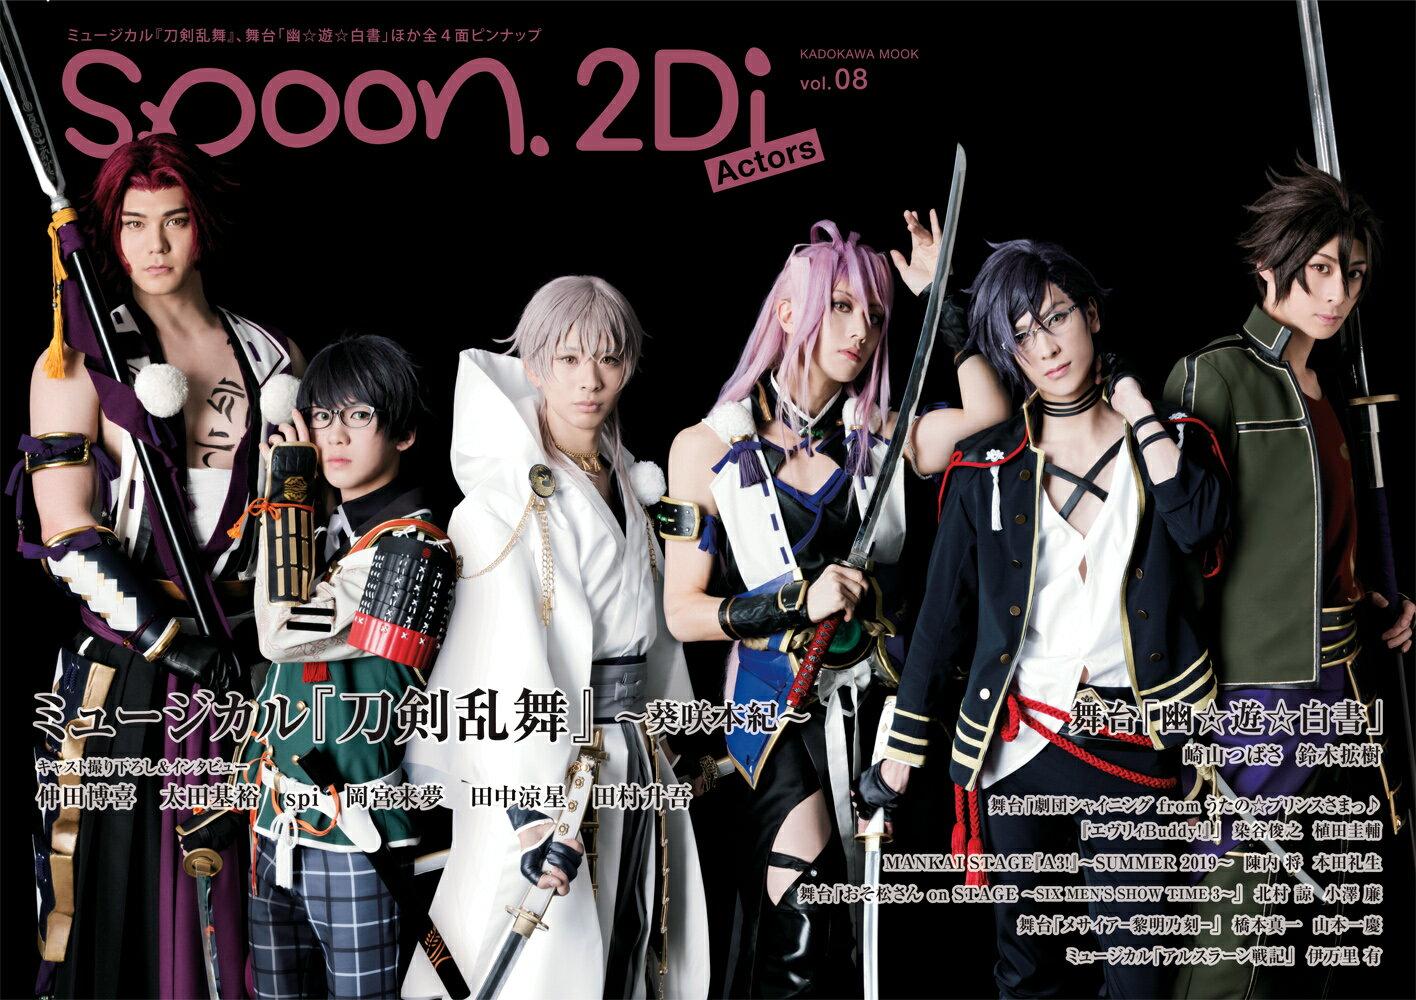 演劇・舞踊, 演劇 spoon.2Di Actors vol.8